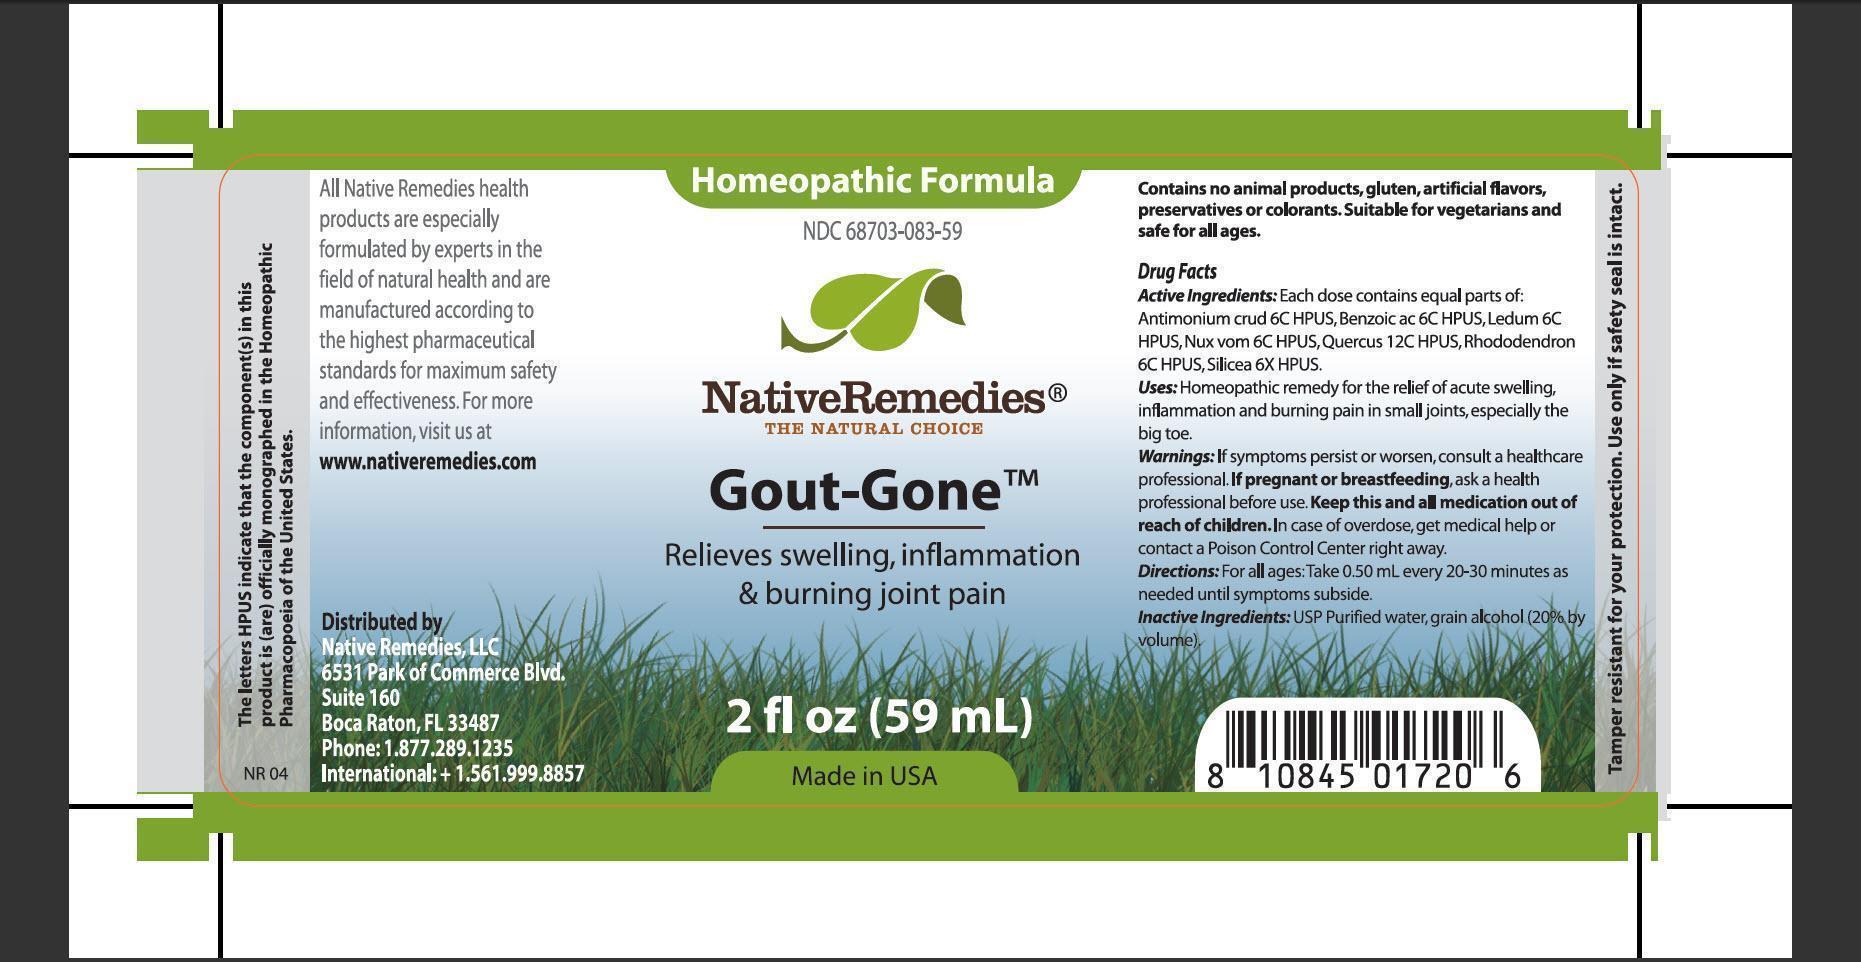 Gout Gone (Antimoium Crud, Benzoic Ac, Ledum, Nux Vom, Quercus, Rhododendron, Silicea) Tincture [Native Remedies, Llc]